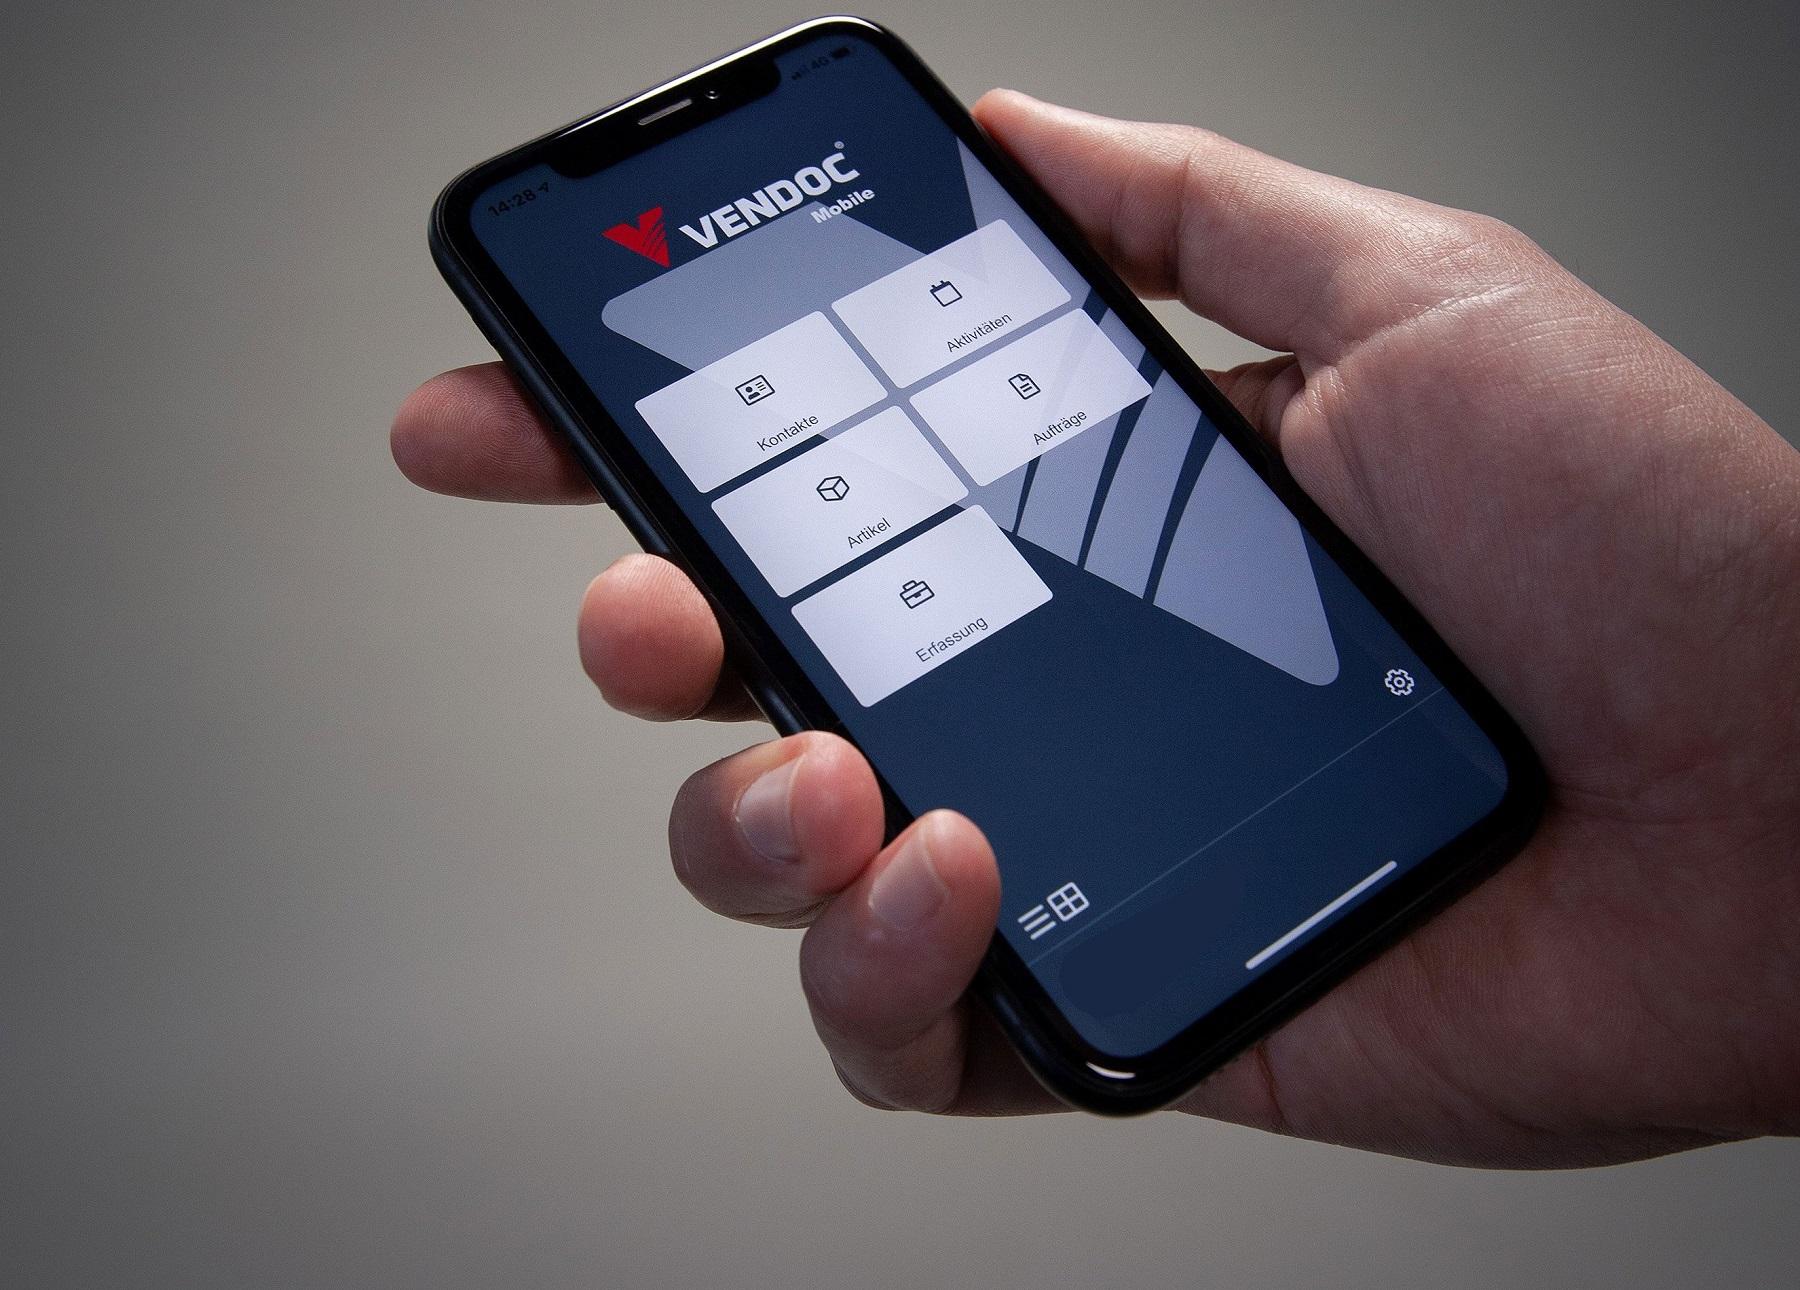 VenDoc Mobile – die neue offlinefähige App